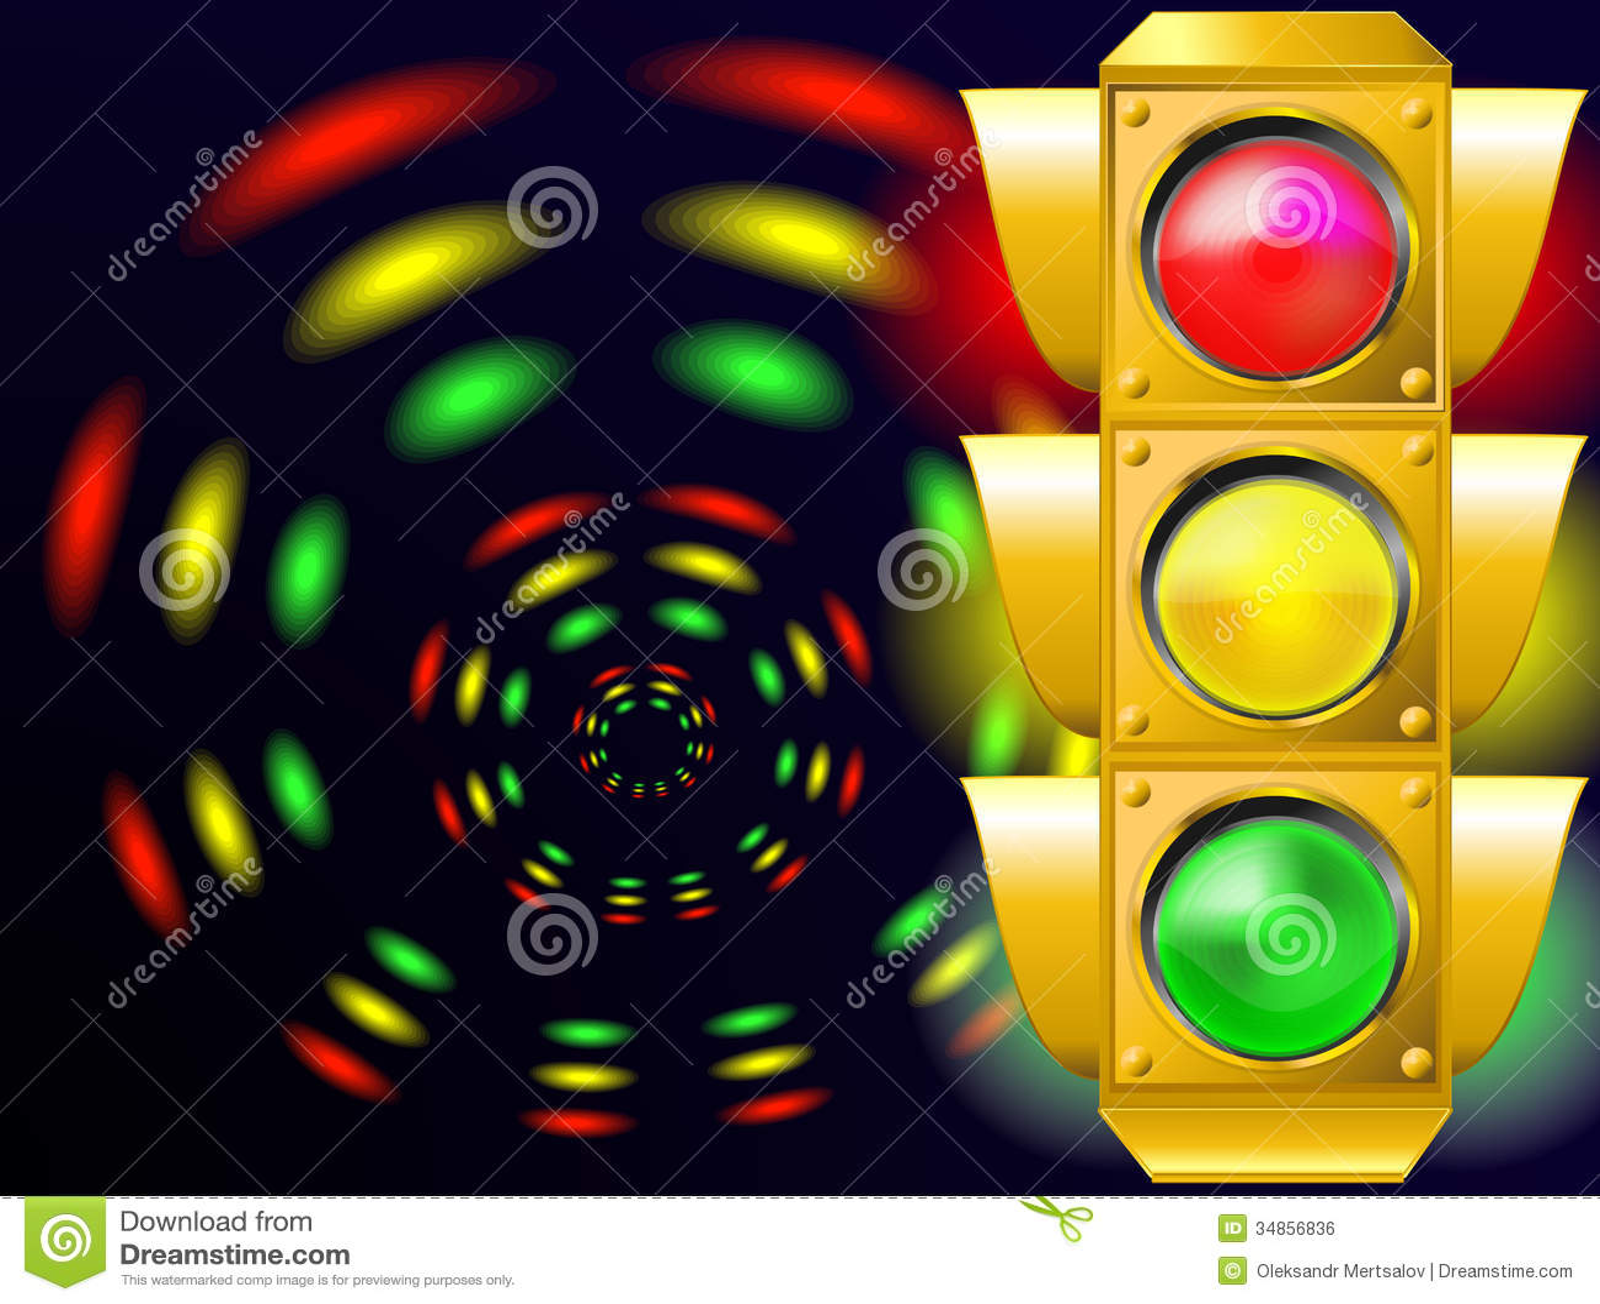 Download Traffic Light Stock Illustration. Illustration Of Order   34856836